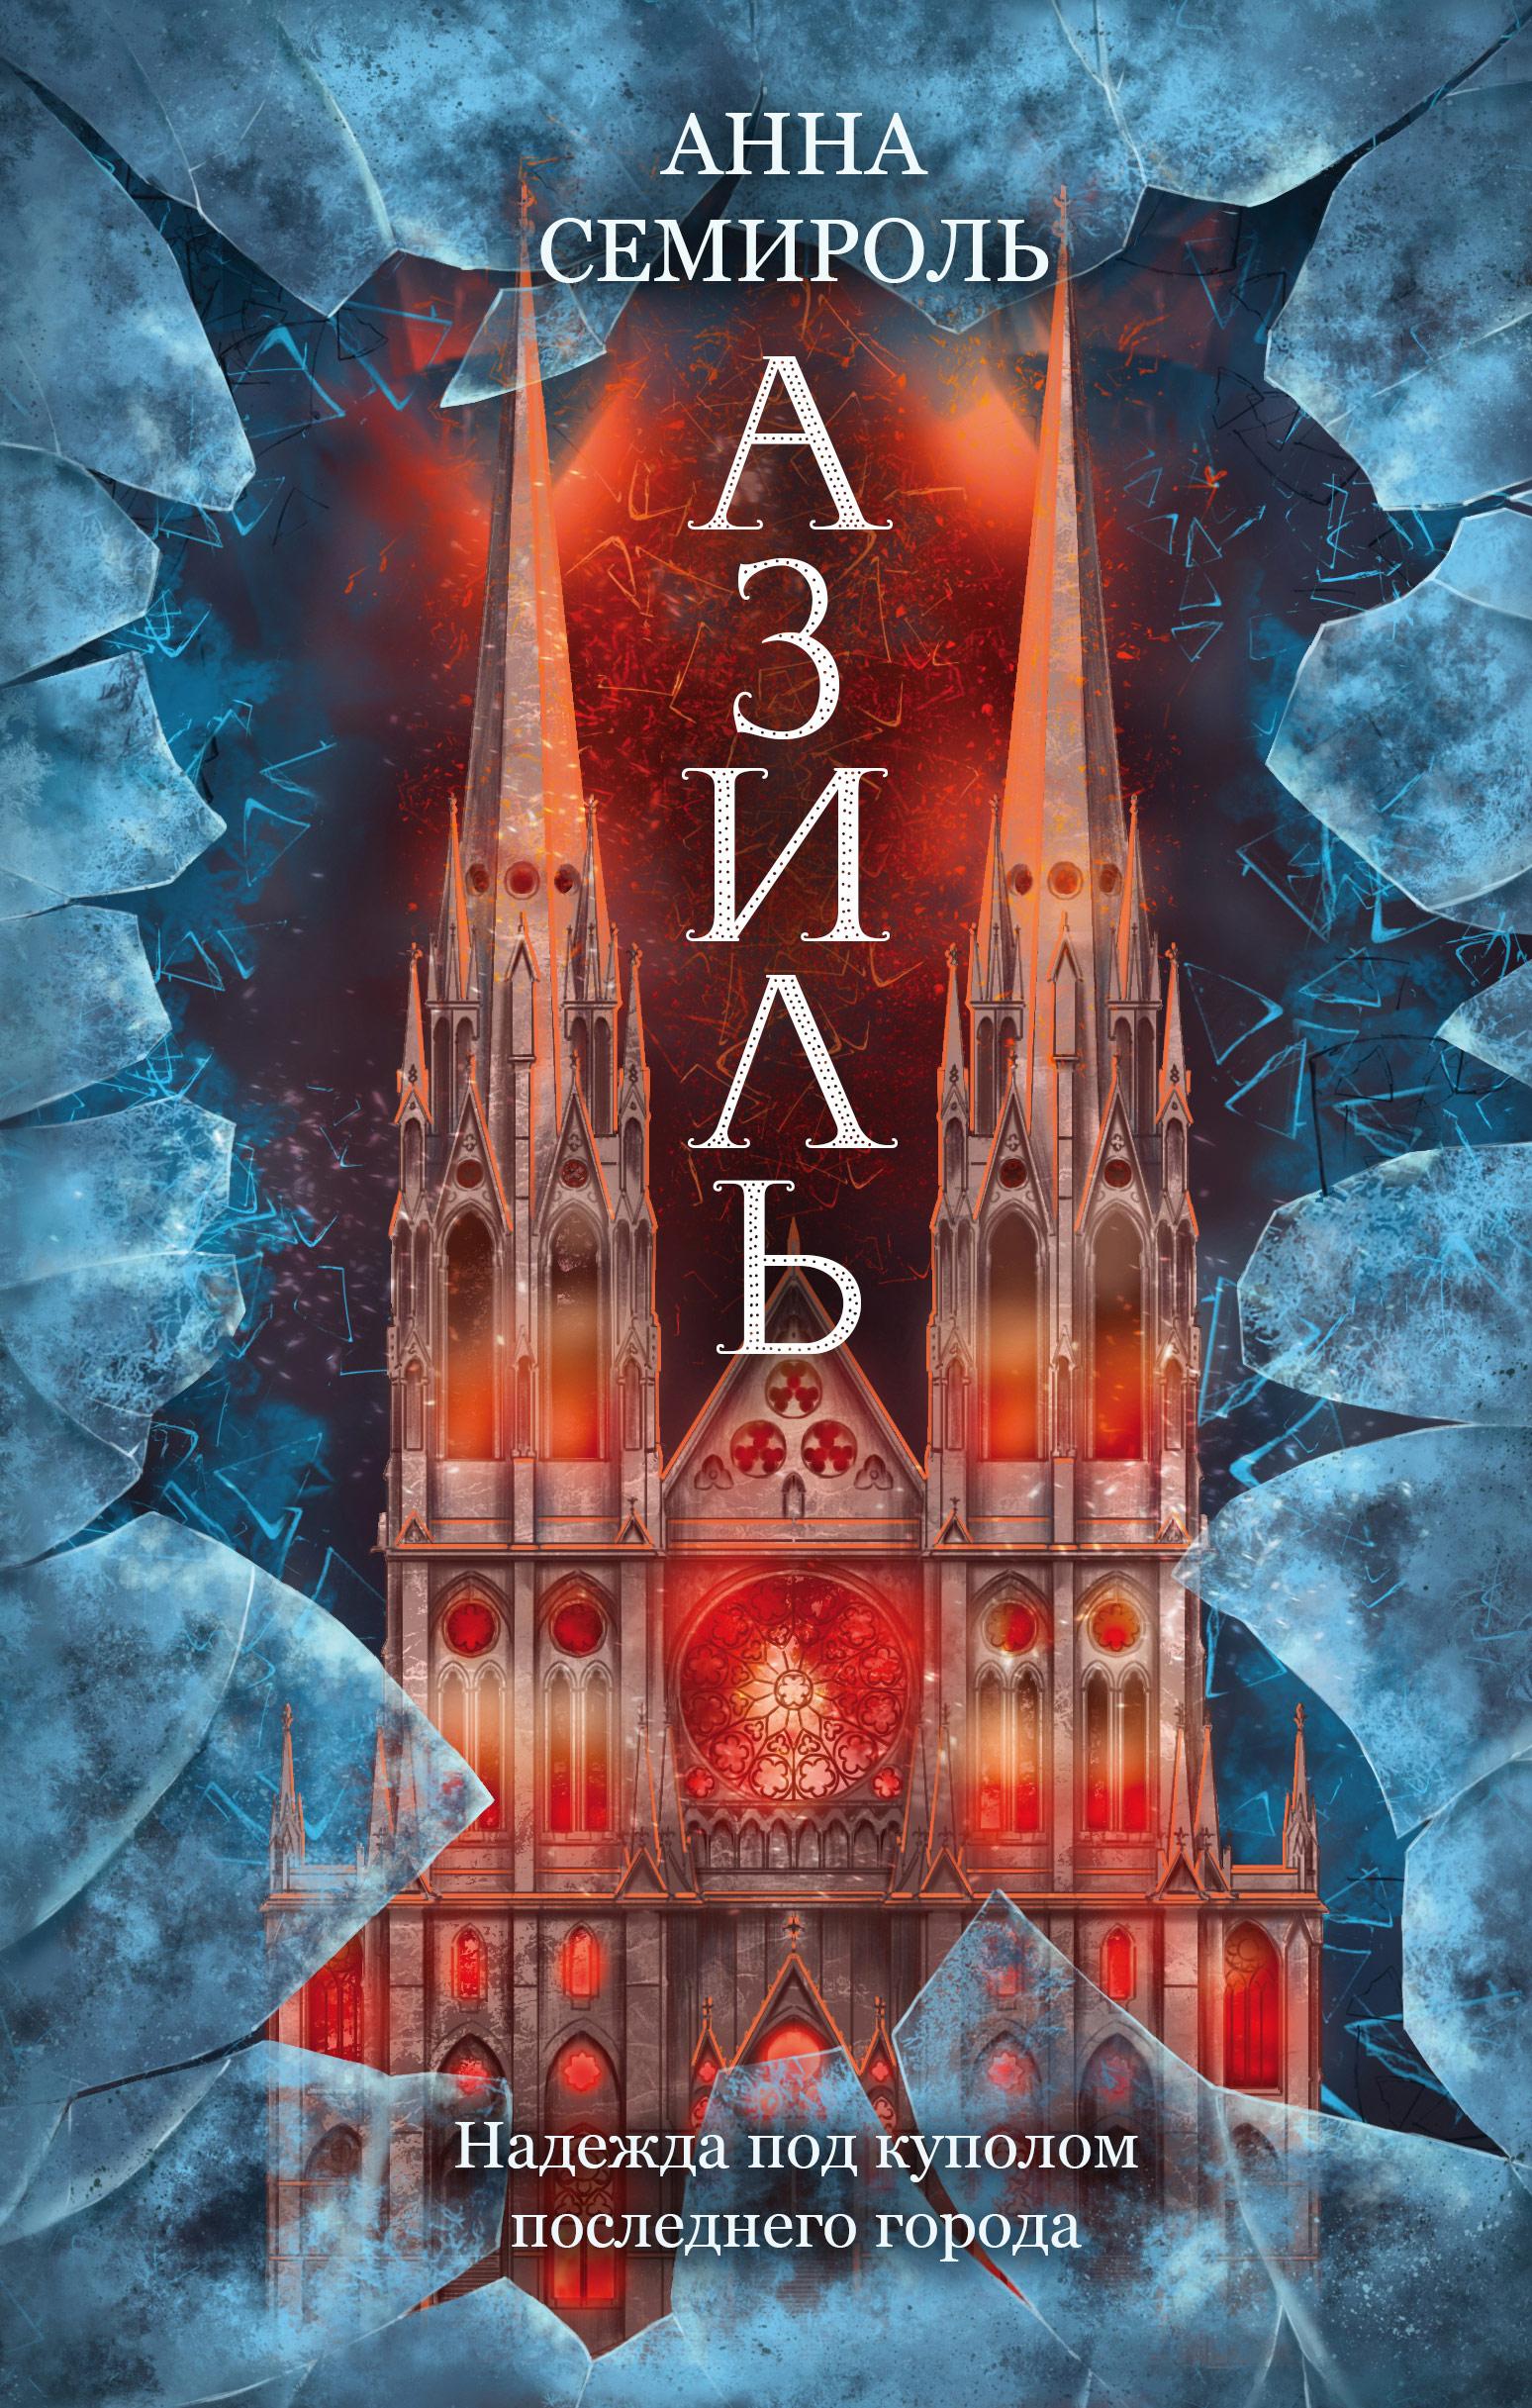 Анна Семироль Азиль хабарова е последний приют призрака